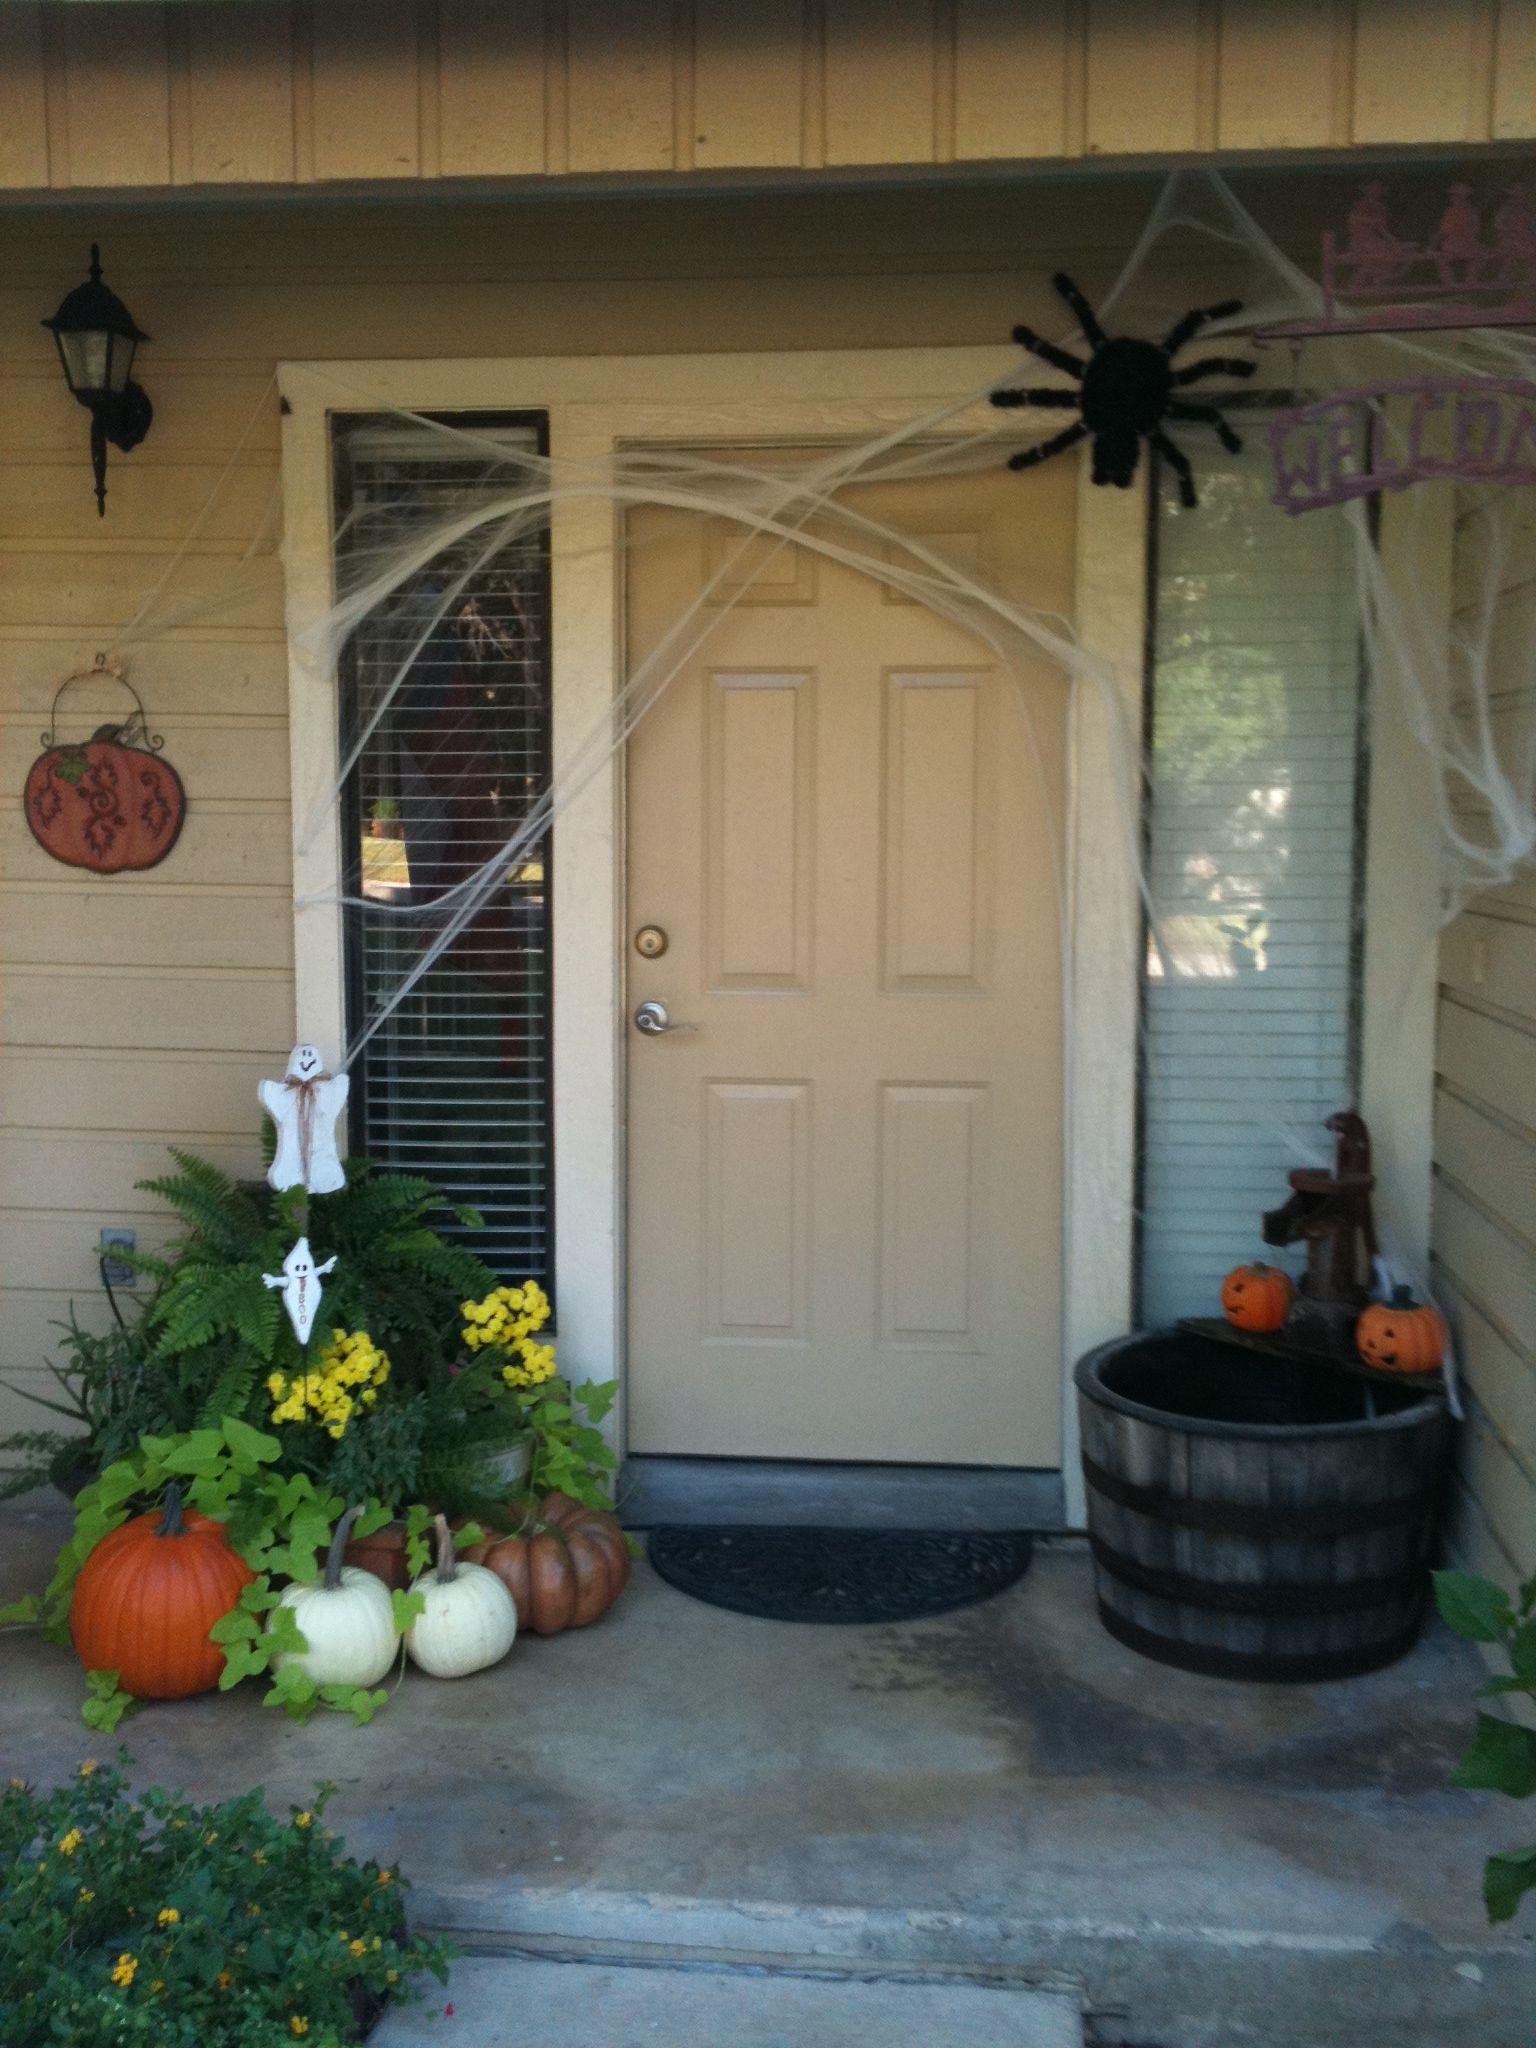 Halloween Front Porch Spooky Halloween Pinterest Spooky halloween - halloween front door decor